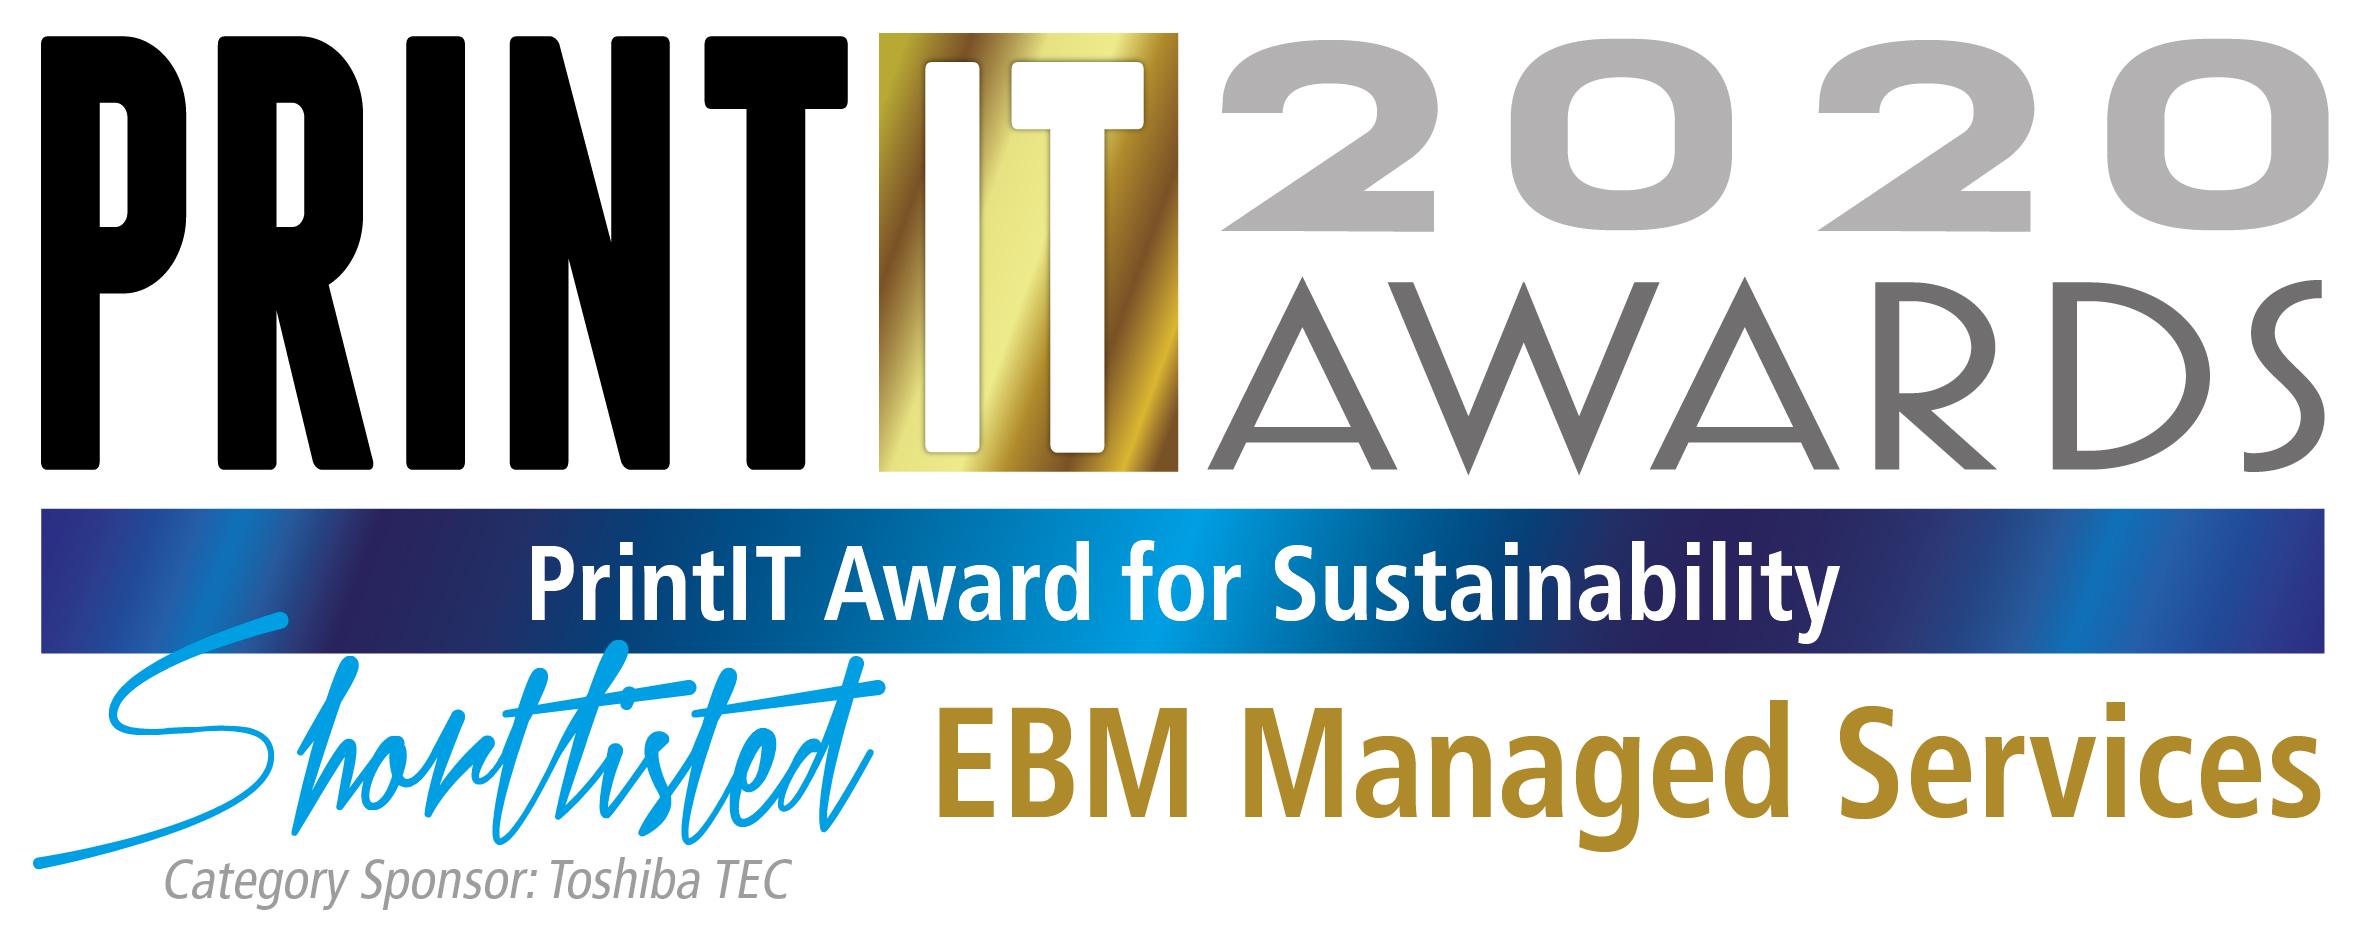 Print IT Awards 2020 - Shortlisted Logo